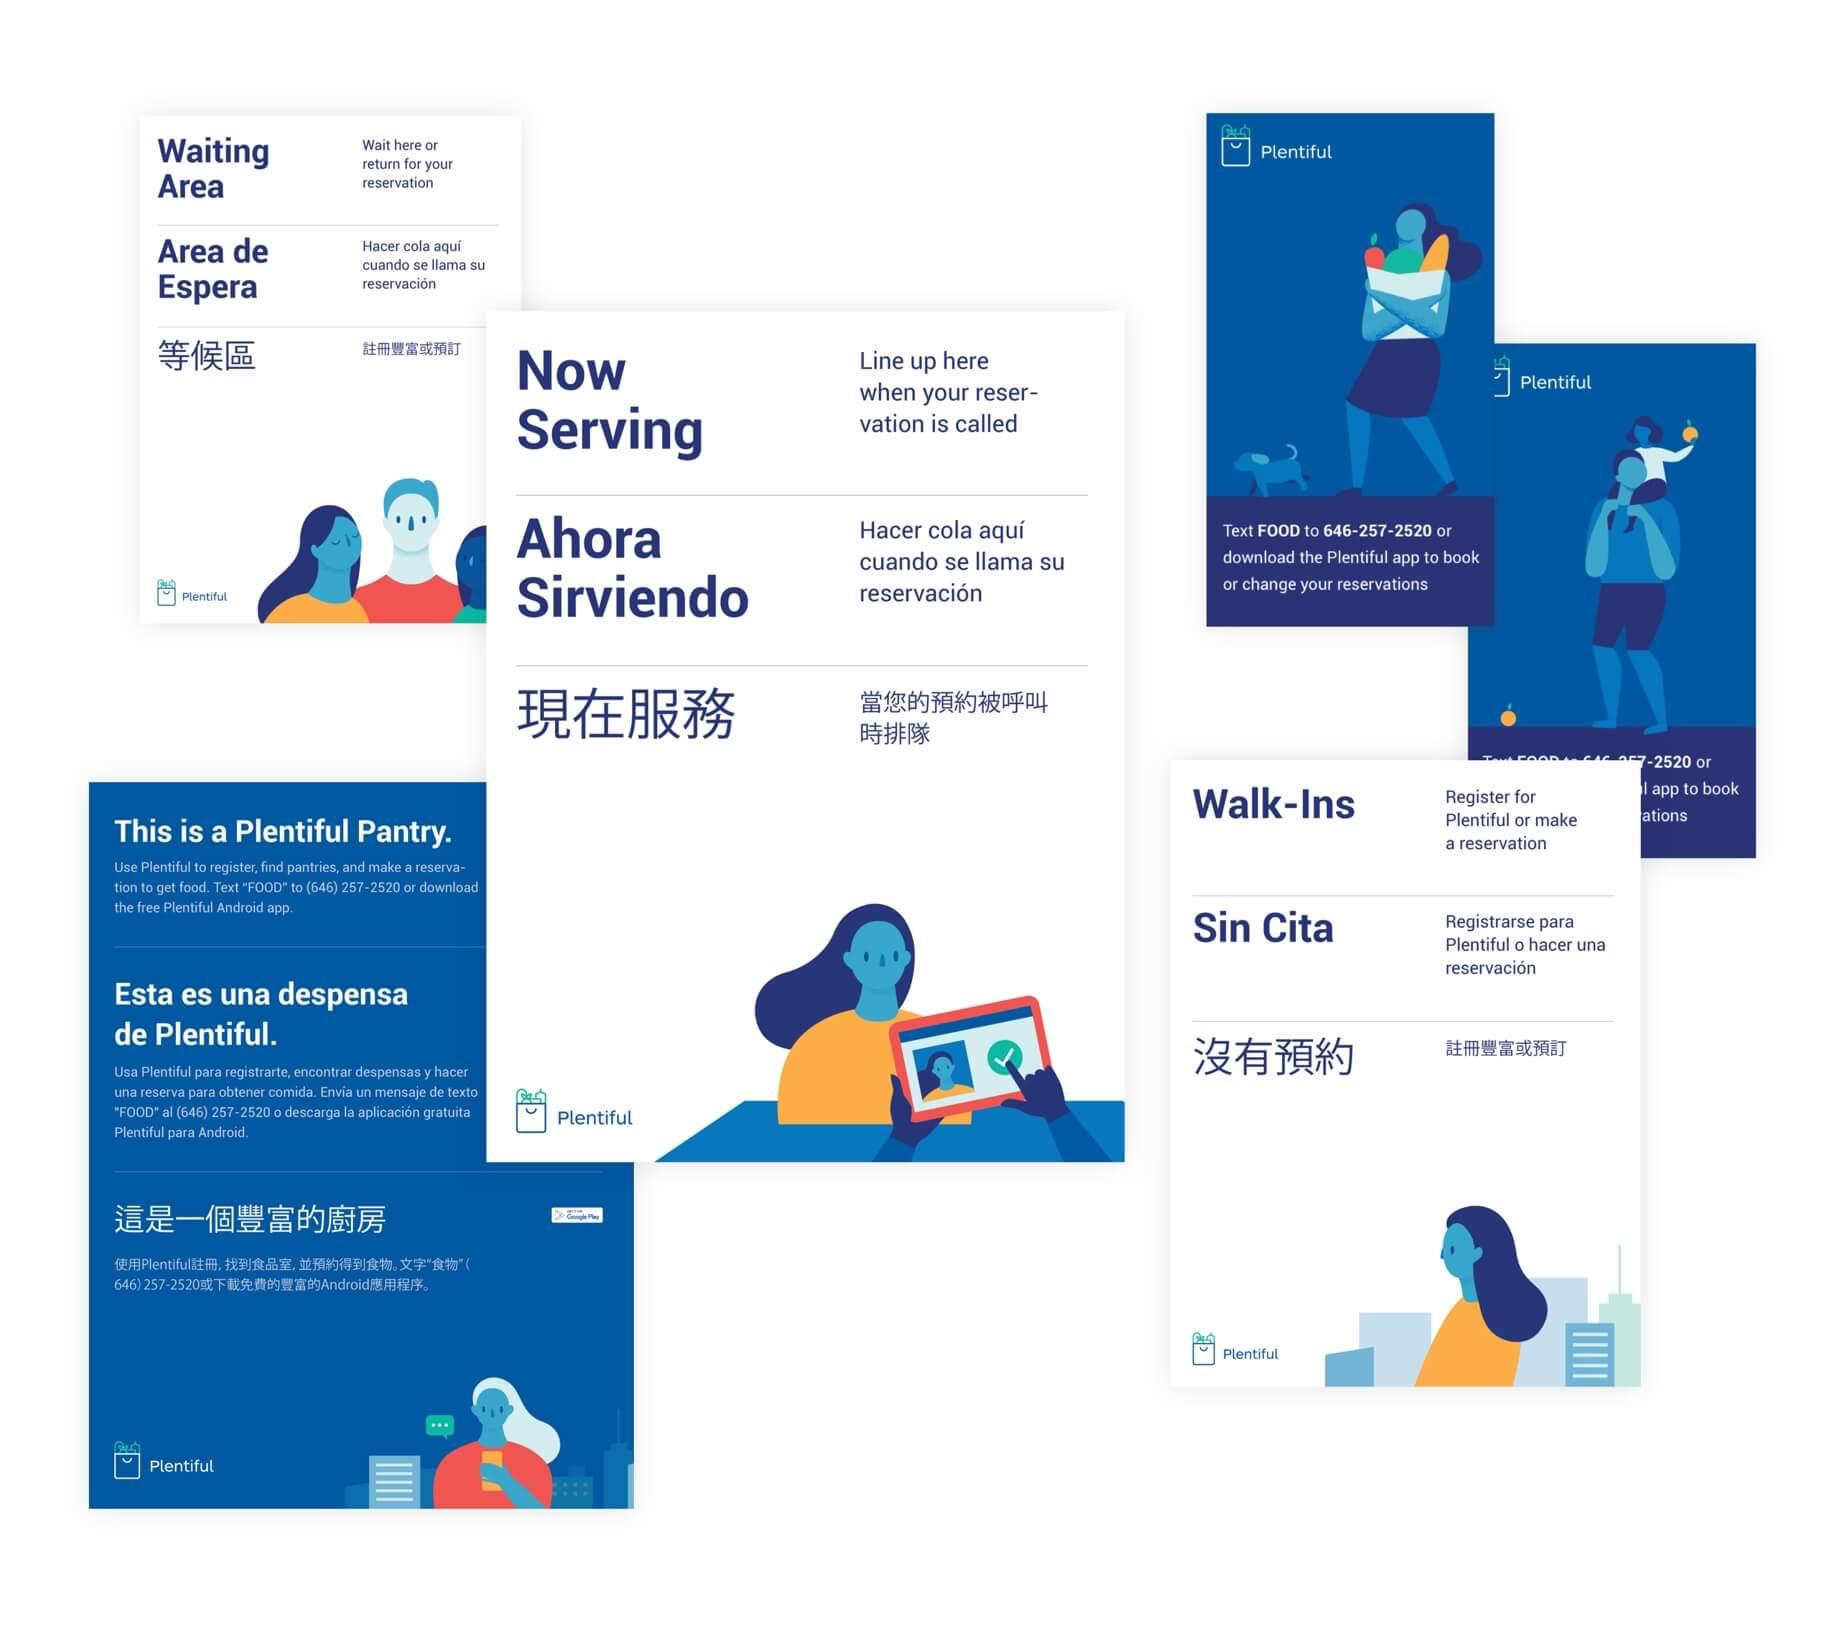 Plentiful design image signage